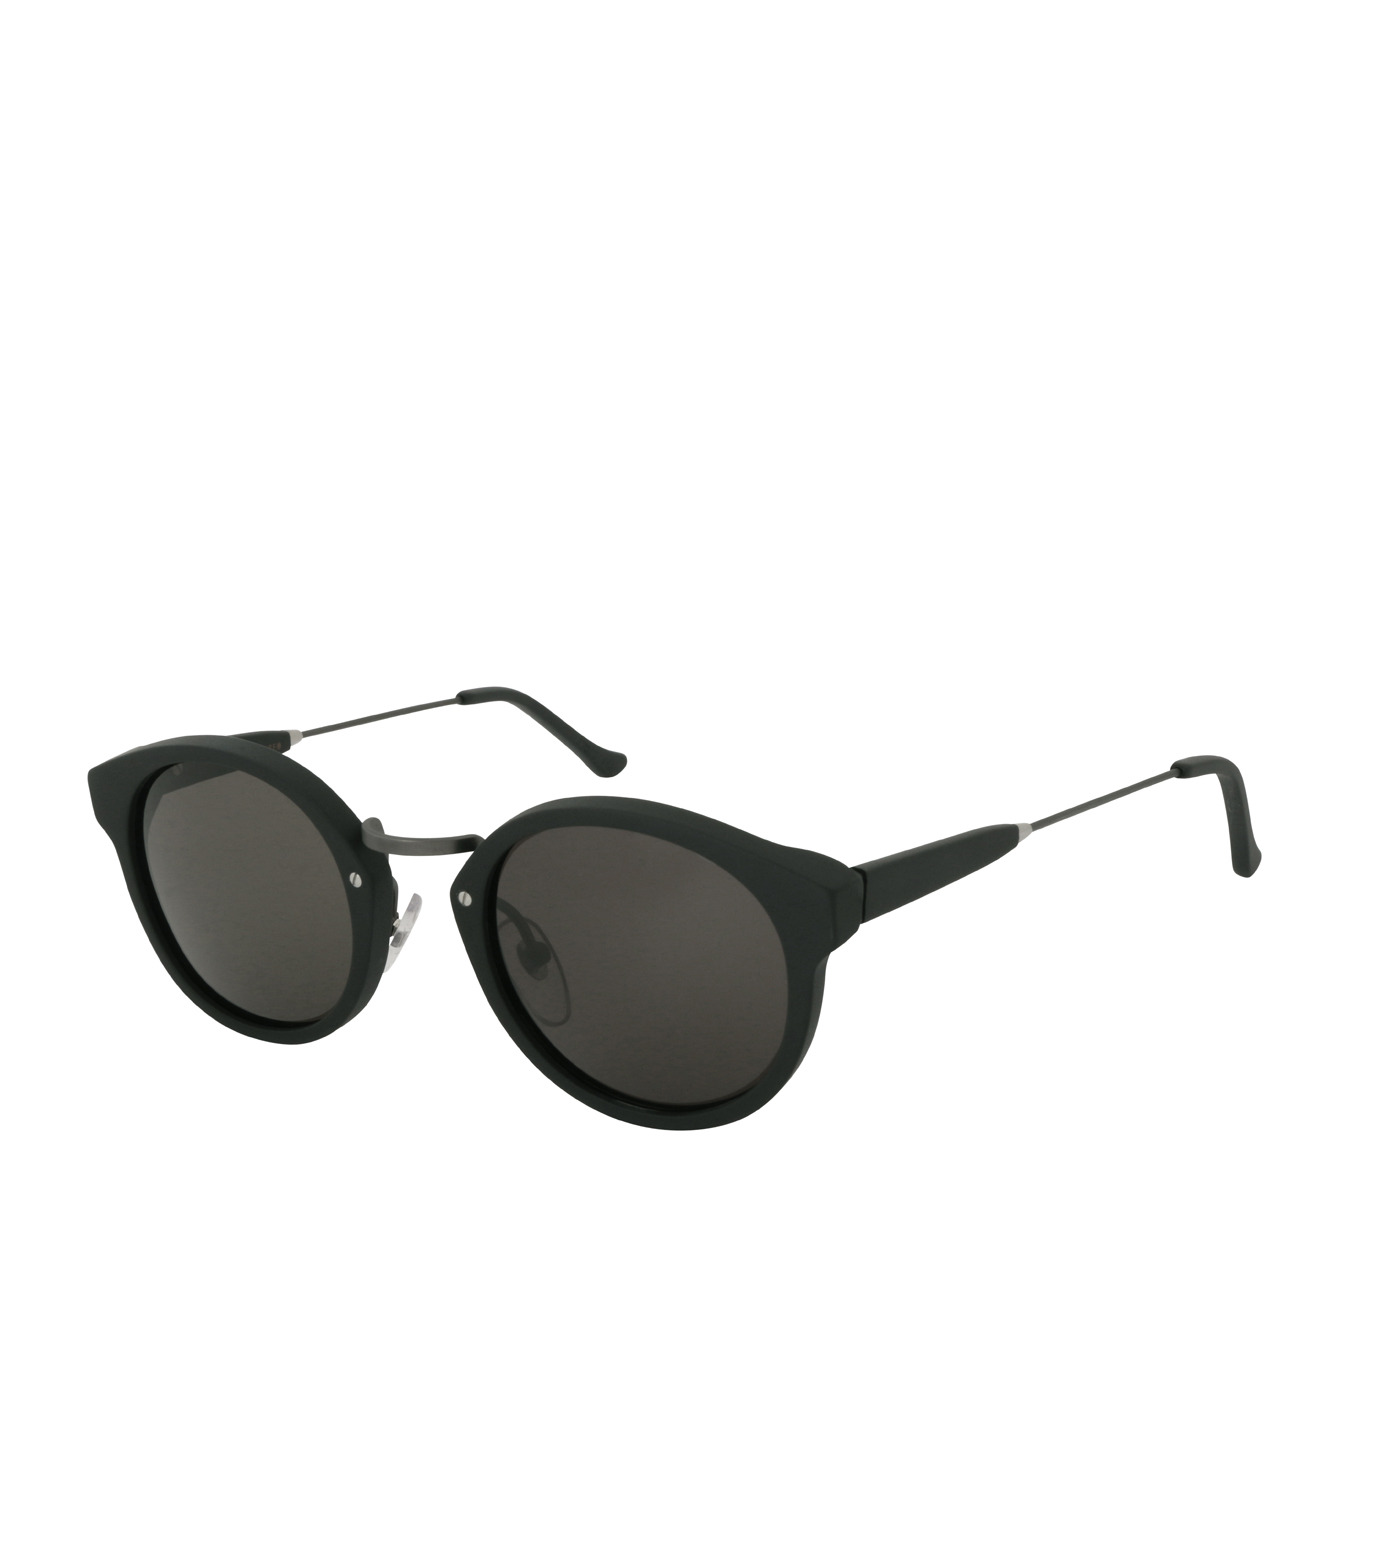 SUPER(スーパー)のPANAMA MAT BLACK-BLACK(アイウェア/eyewear)-SPRXXXX045-13 拡大詳細画像1